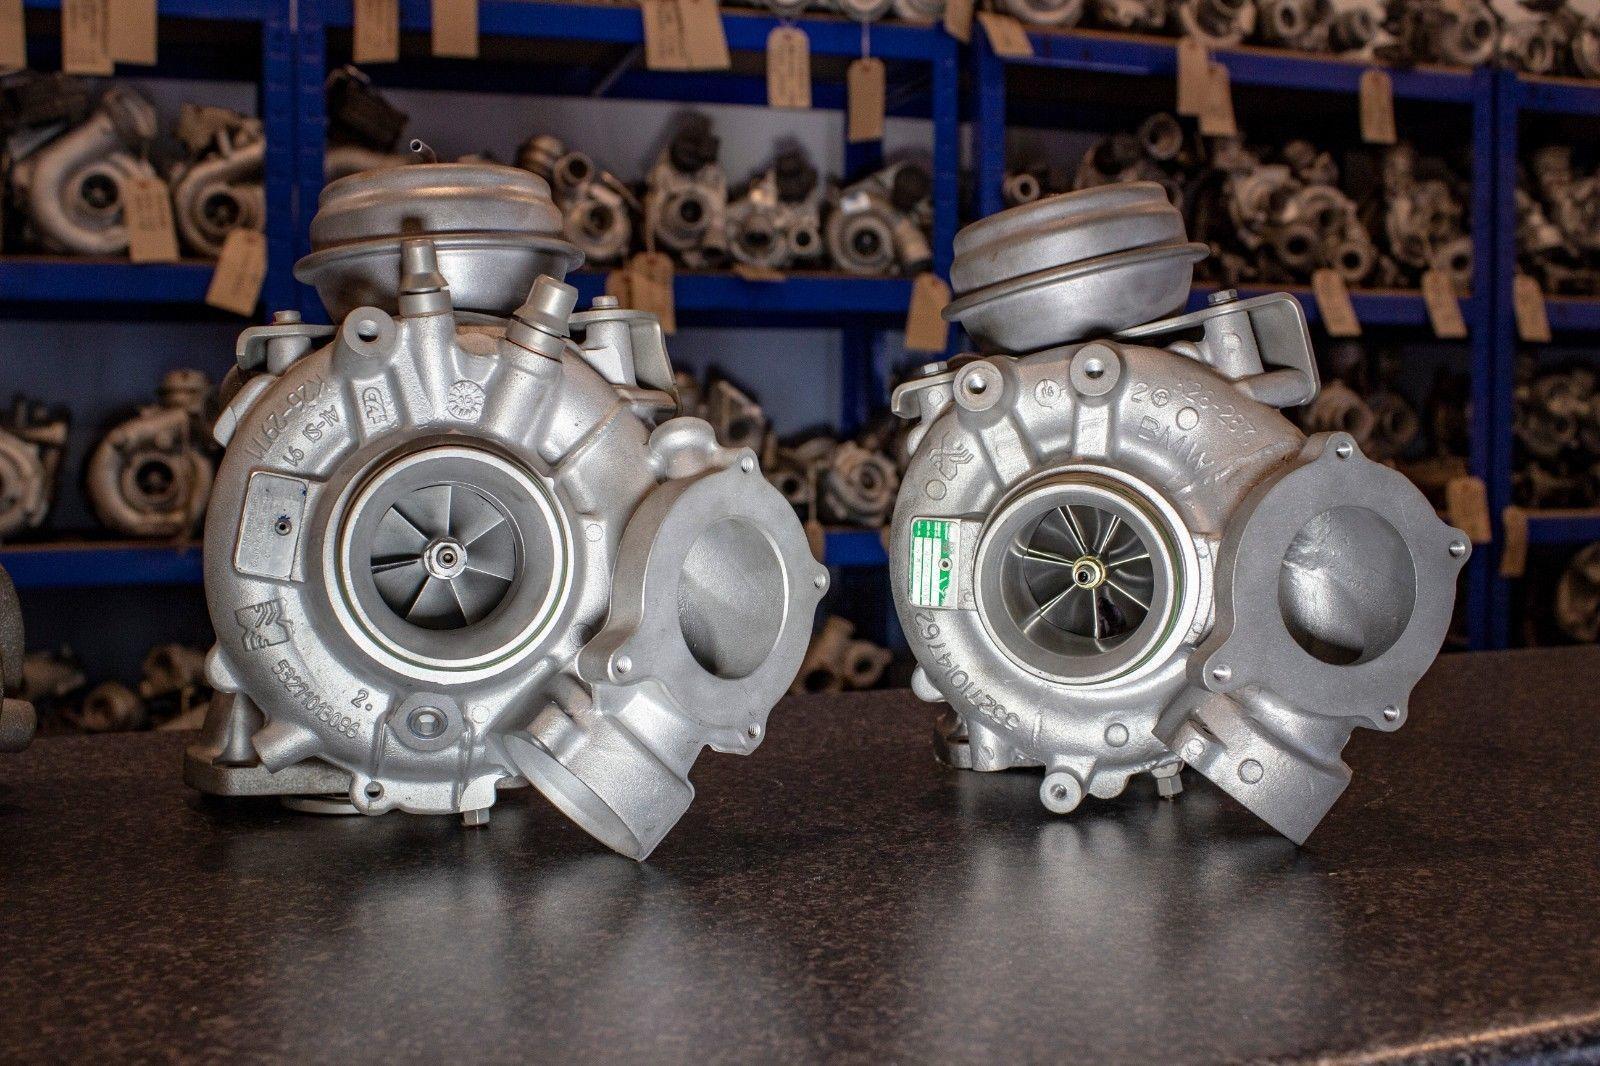 HYBRID-Turbocharger-for-BMW-535d-740d-xd-GT-X5-X6-30-53269700005-163264839498-7